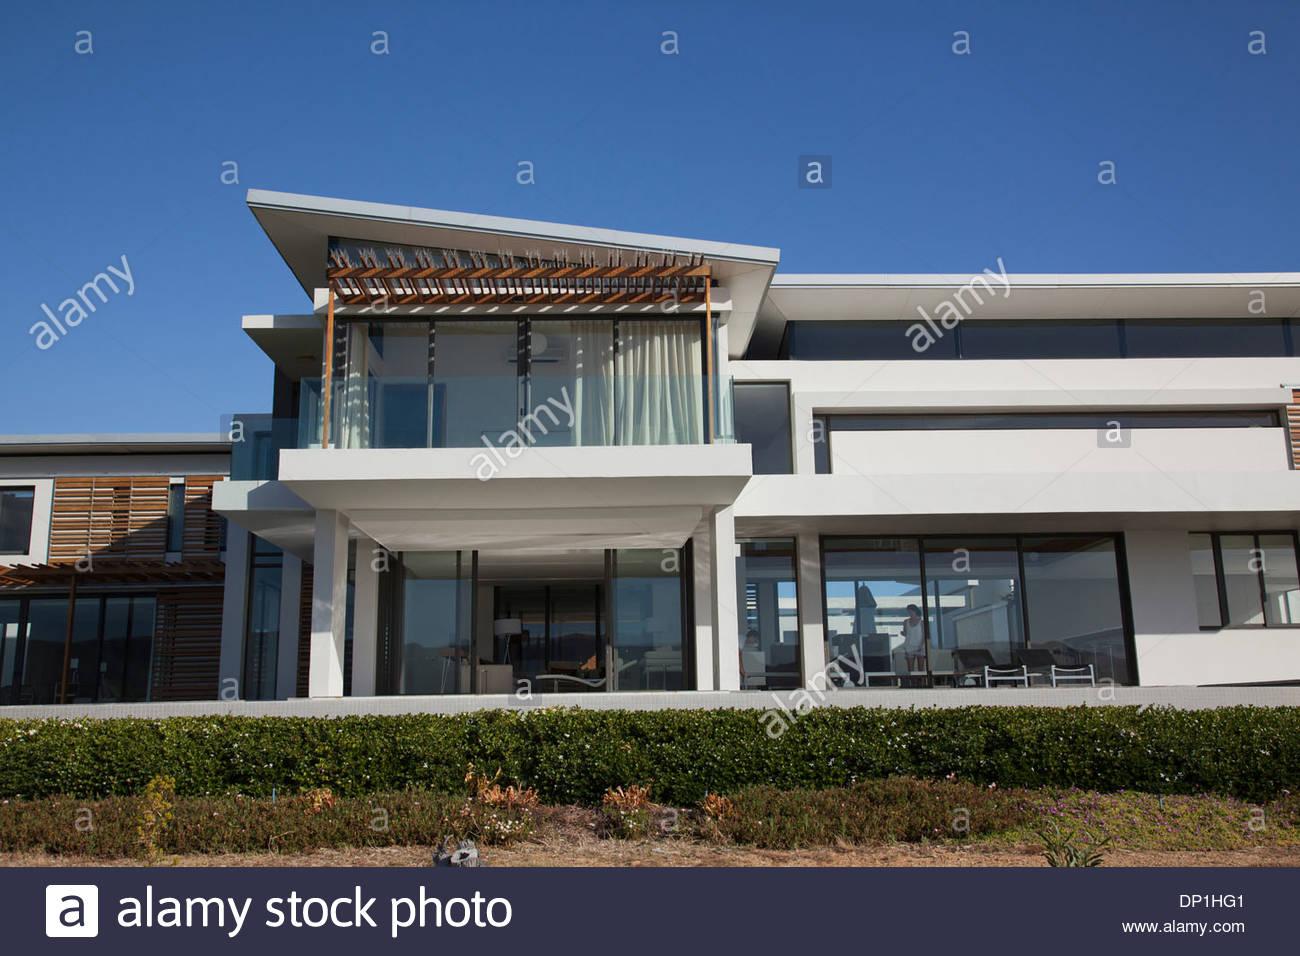 Modern house exterior - Stock Image